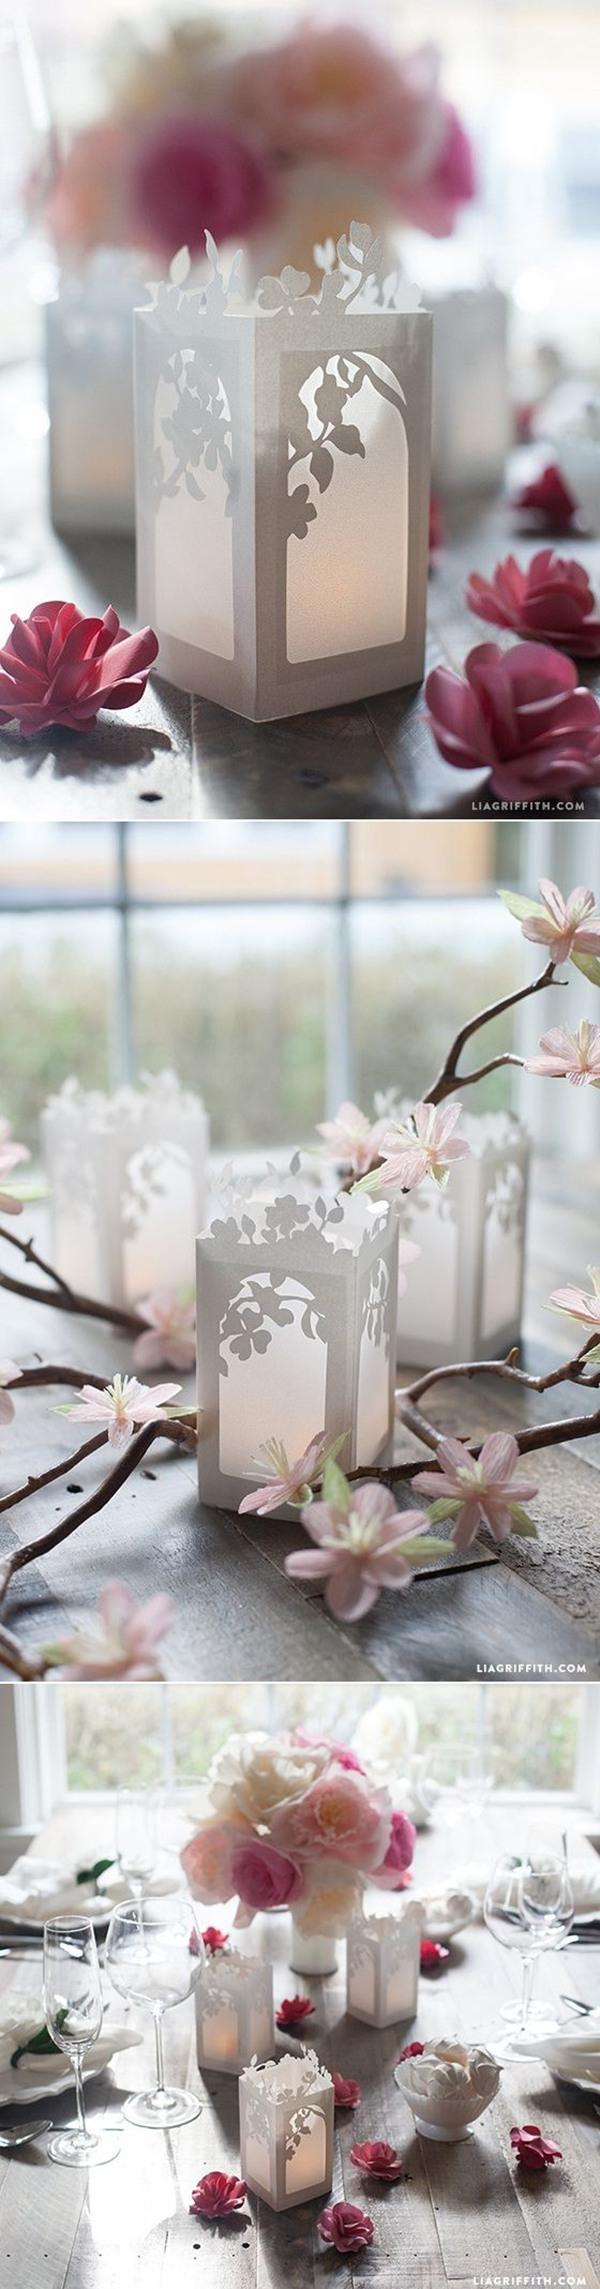 Diy Wedding Centerpiece 20 Creative Diy Wedding Ideas For 2016 Spring